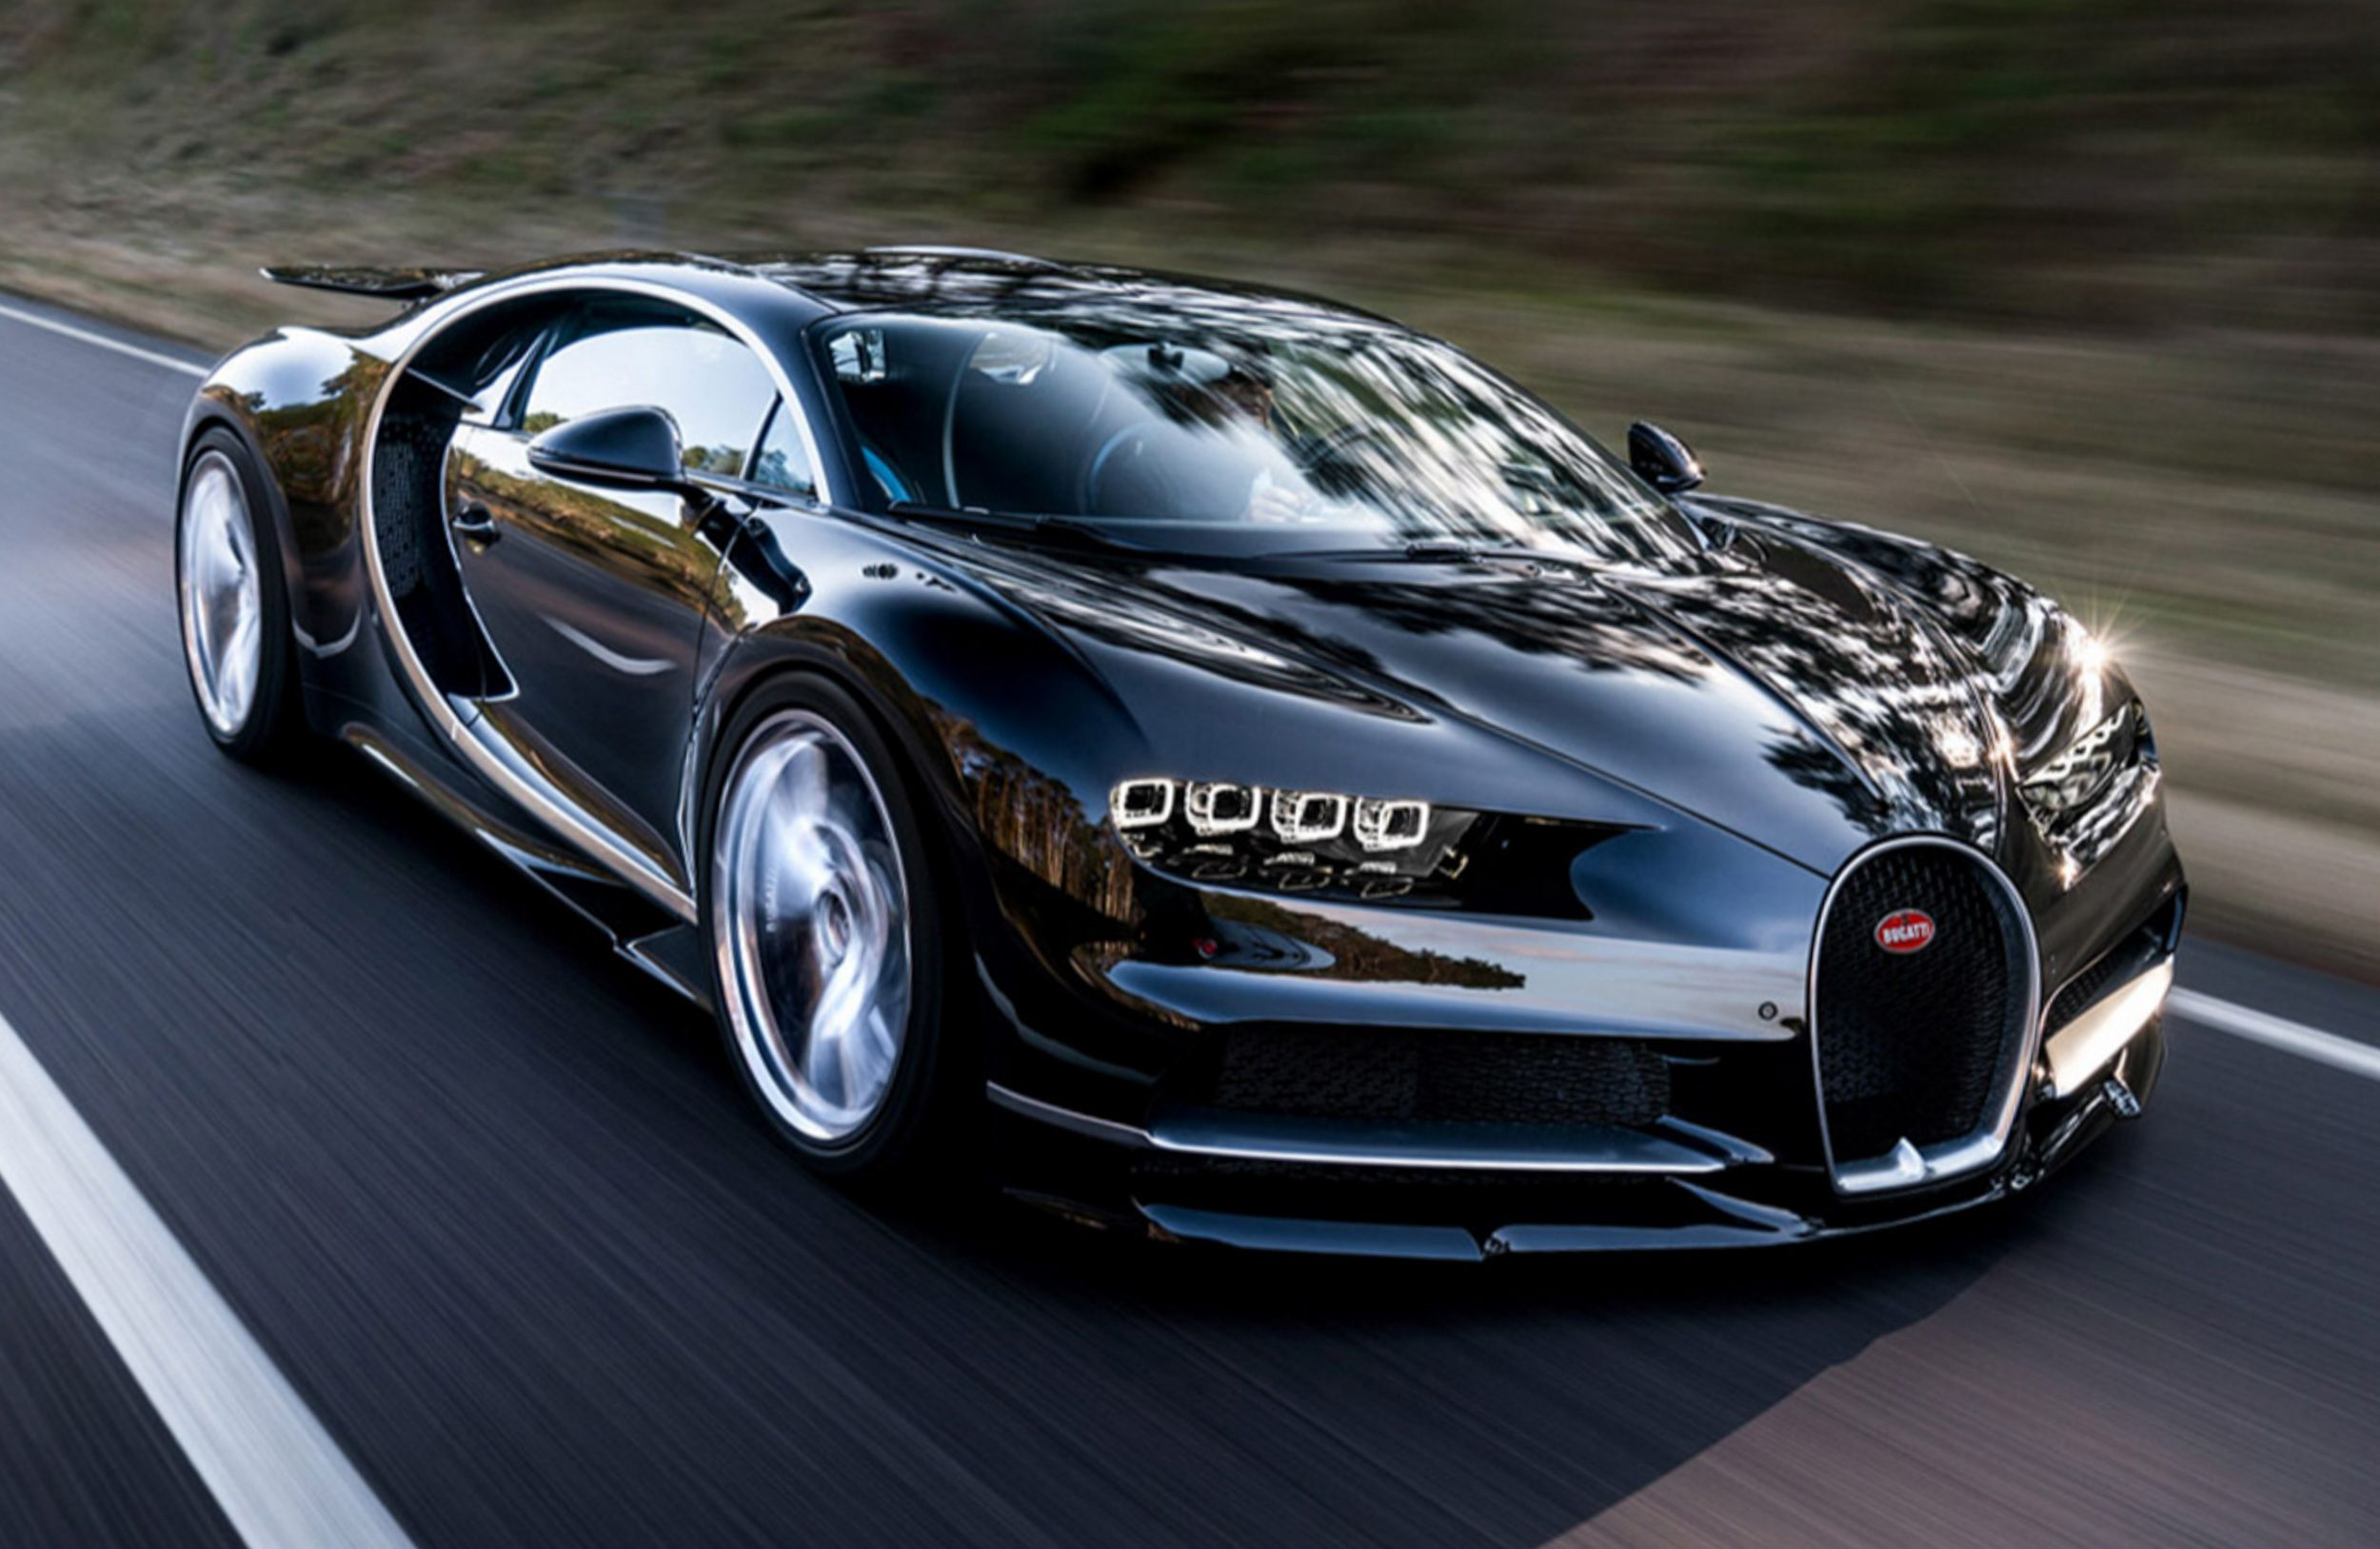 ed87028b538a69f979473831c5b37c0a Inspiring Bugatti Veyron Price Australian Dollars Cars Trend